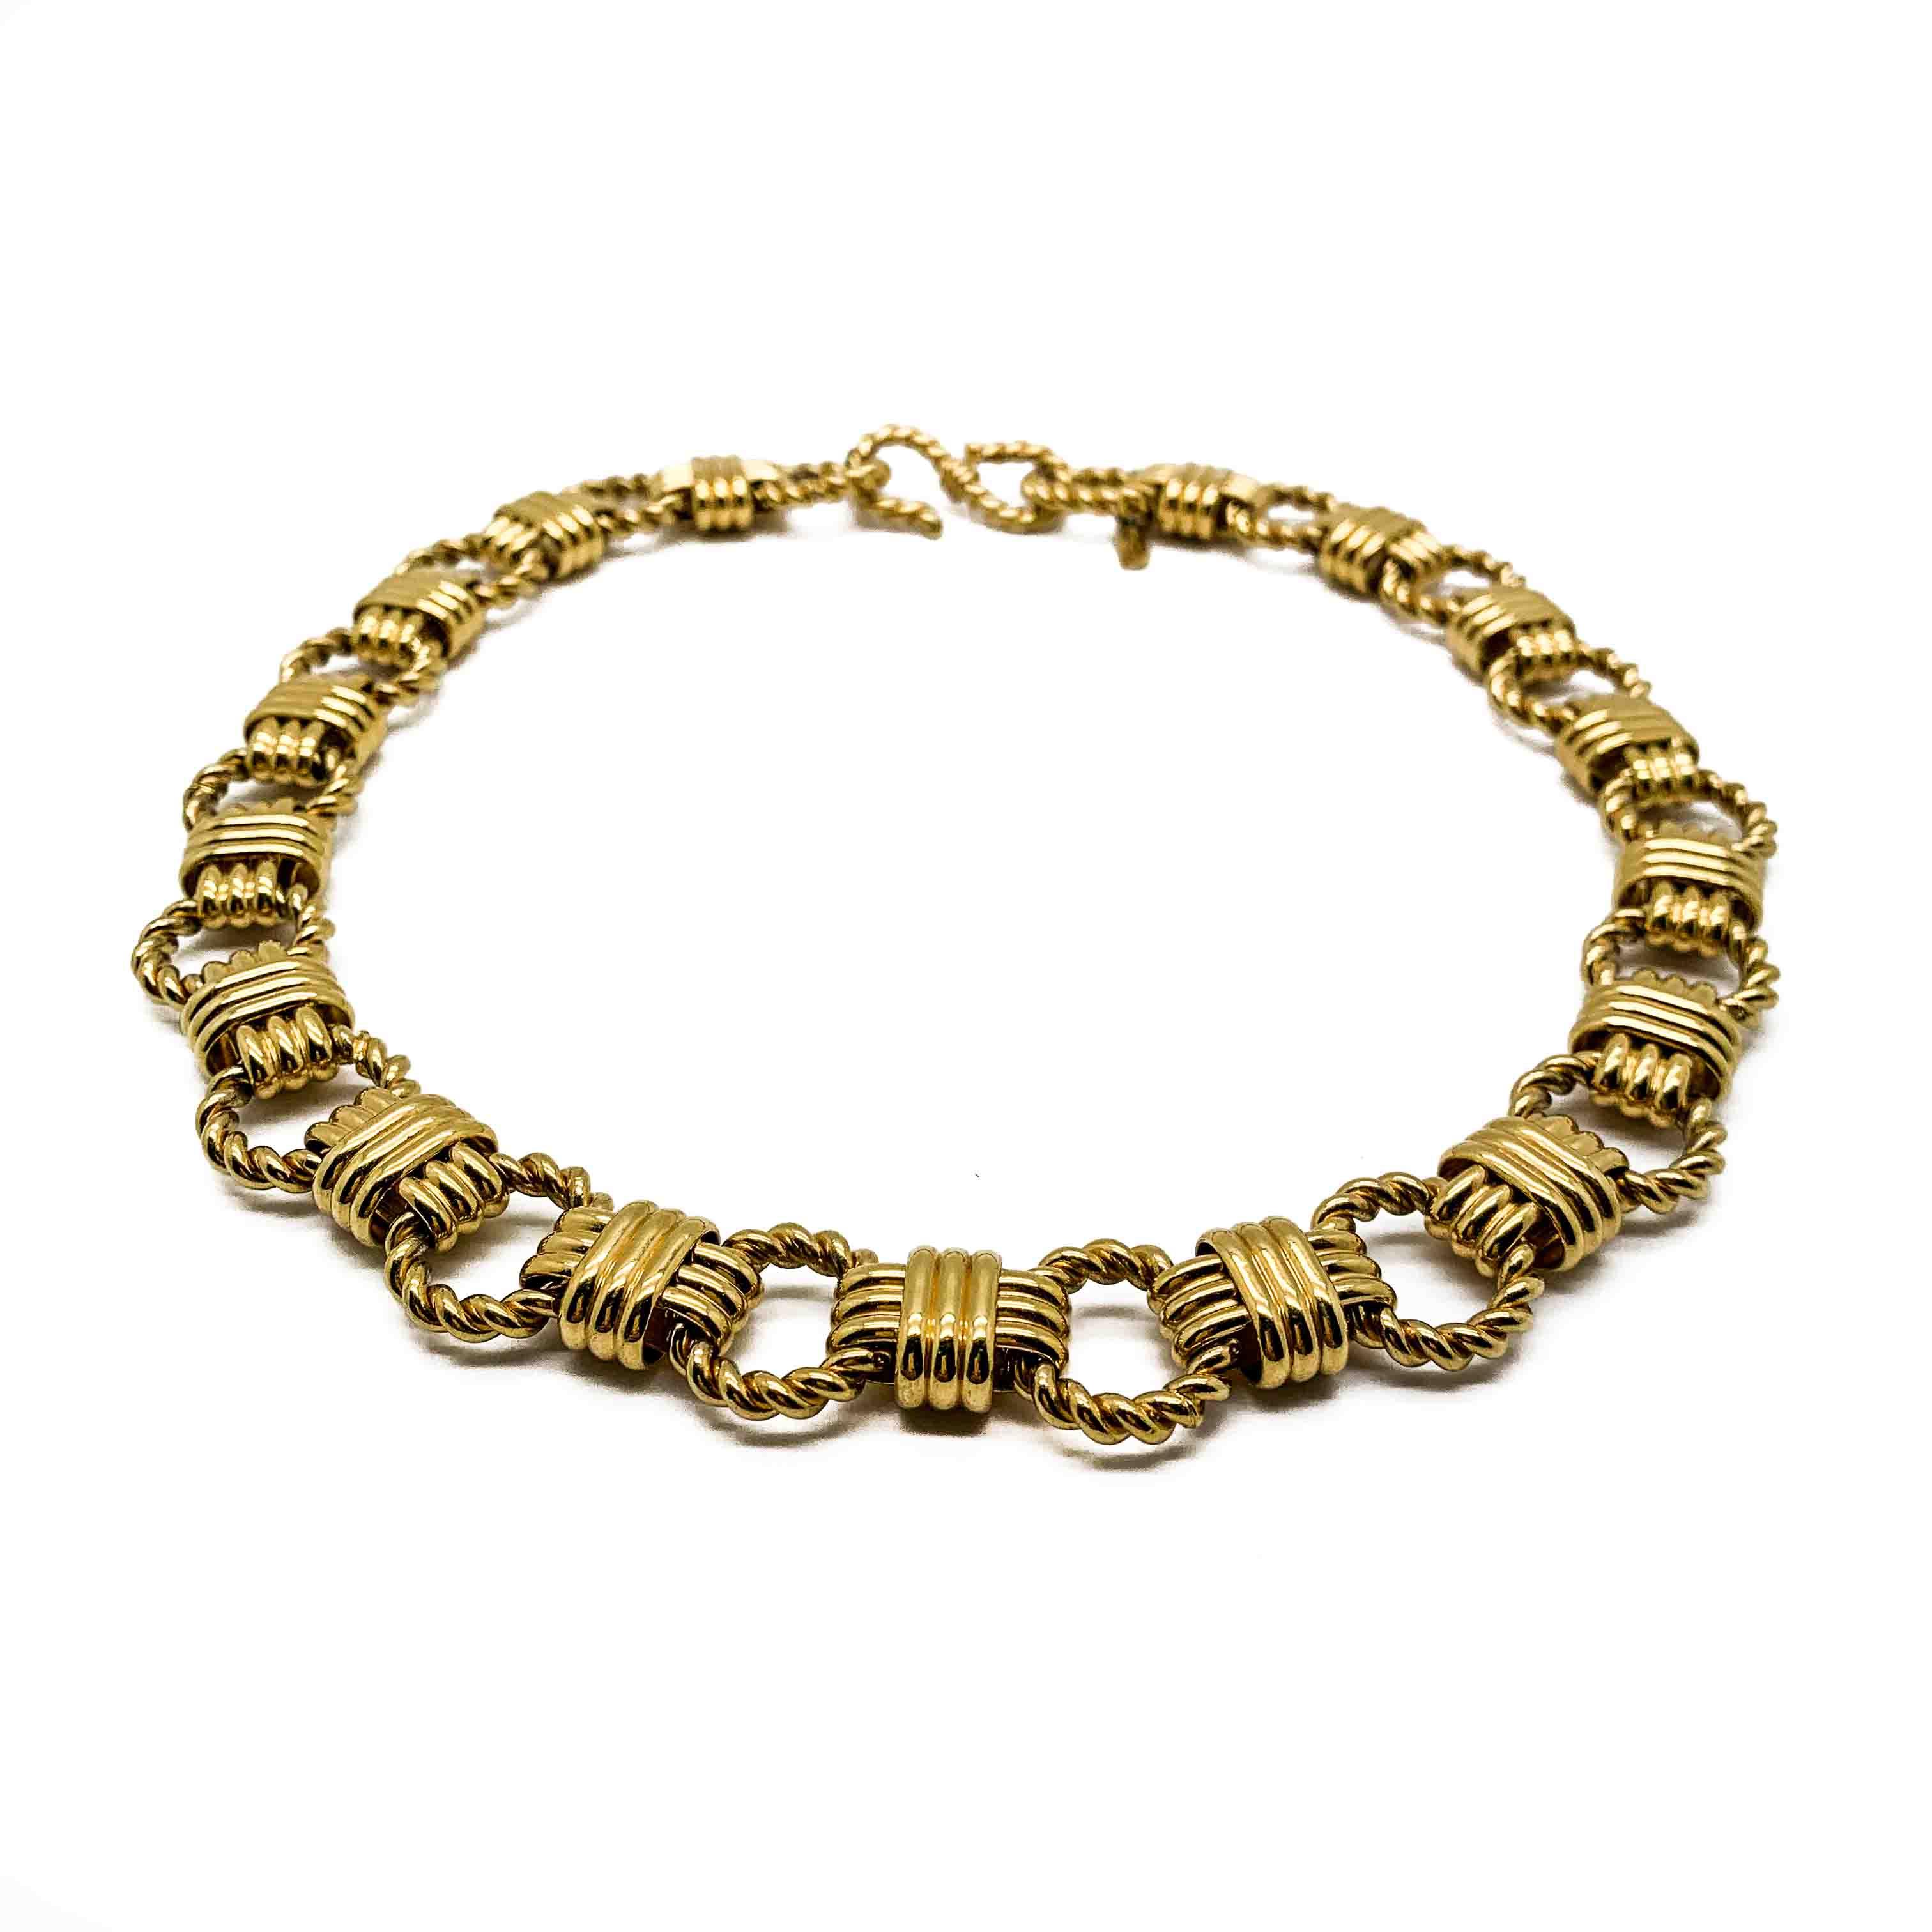 Vintage Monet Rope Necklace Vintage Jennifer Gibson Jewellery